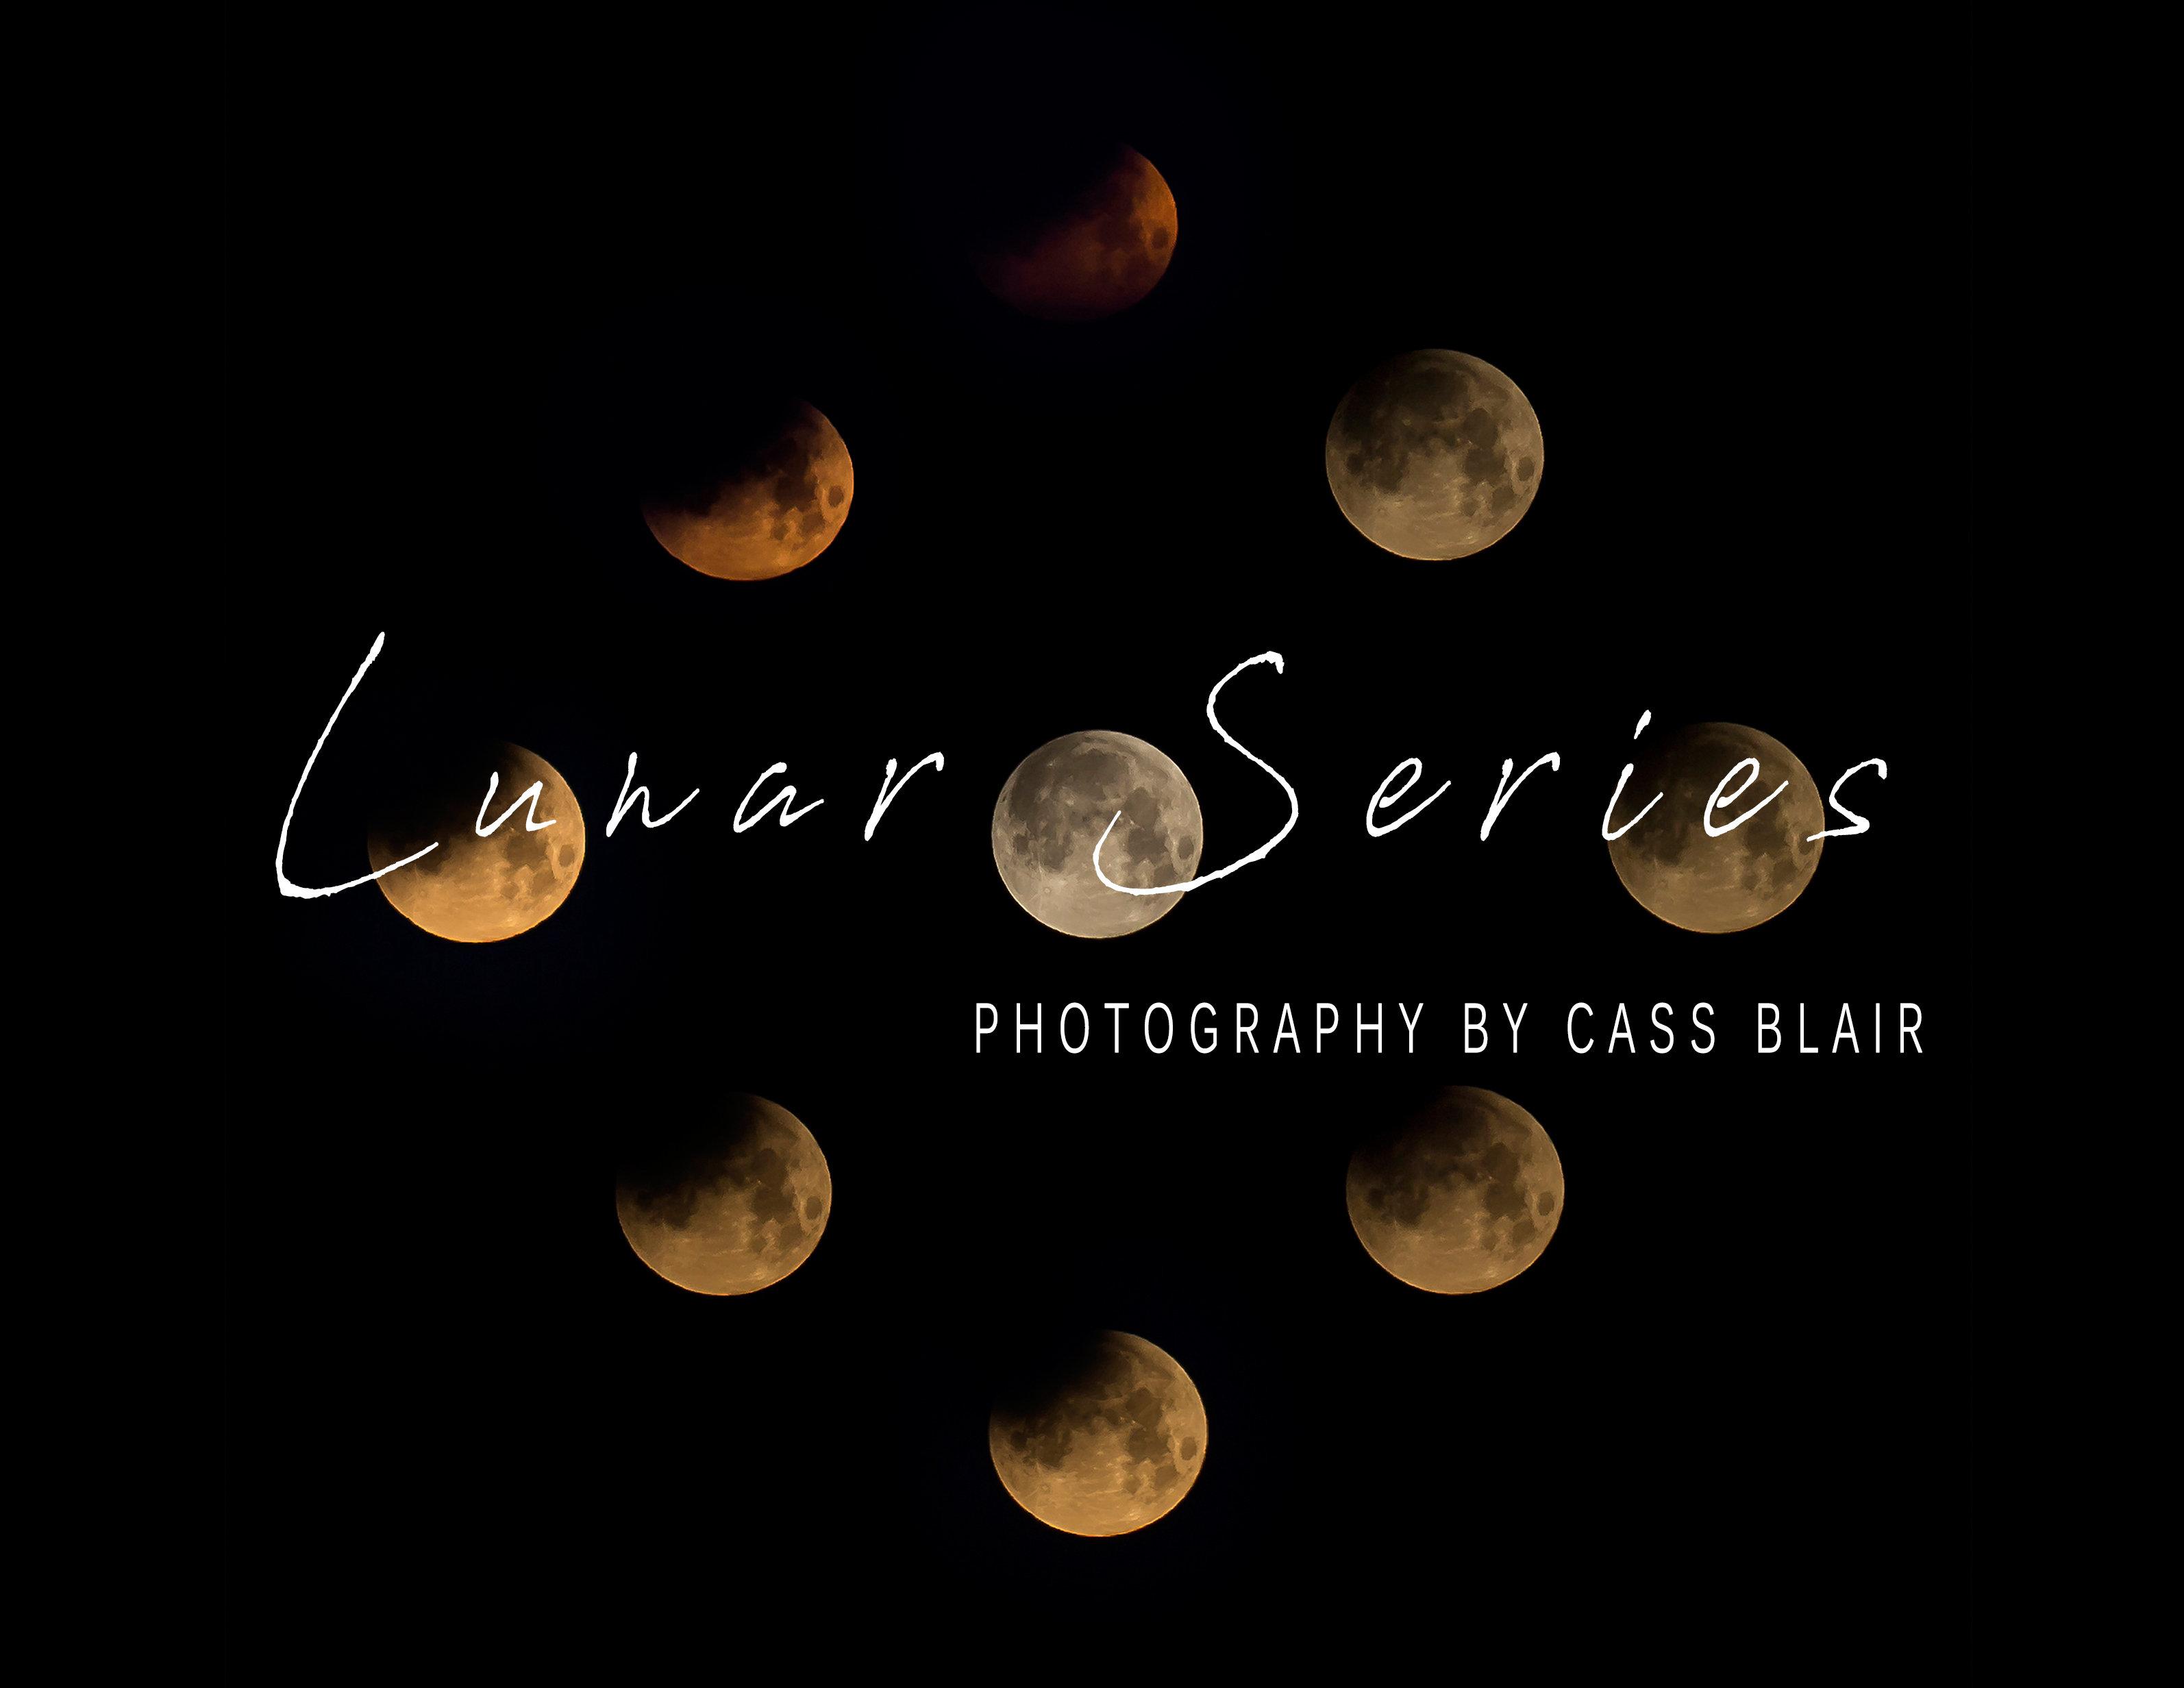 2020 Lunar Series Calendar